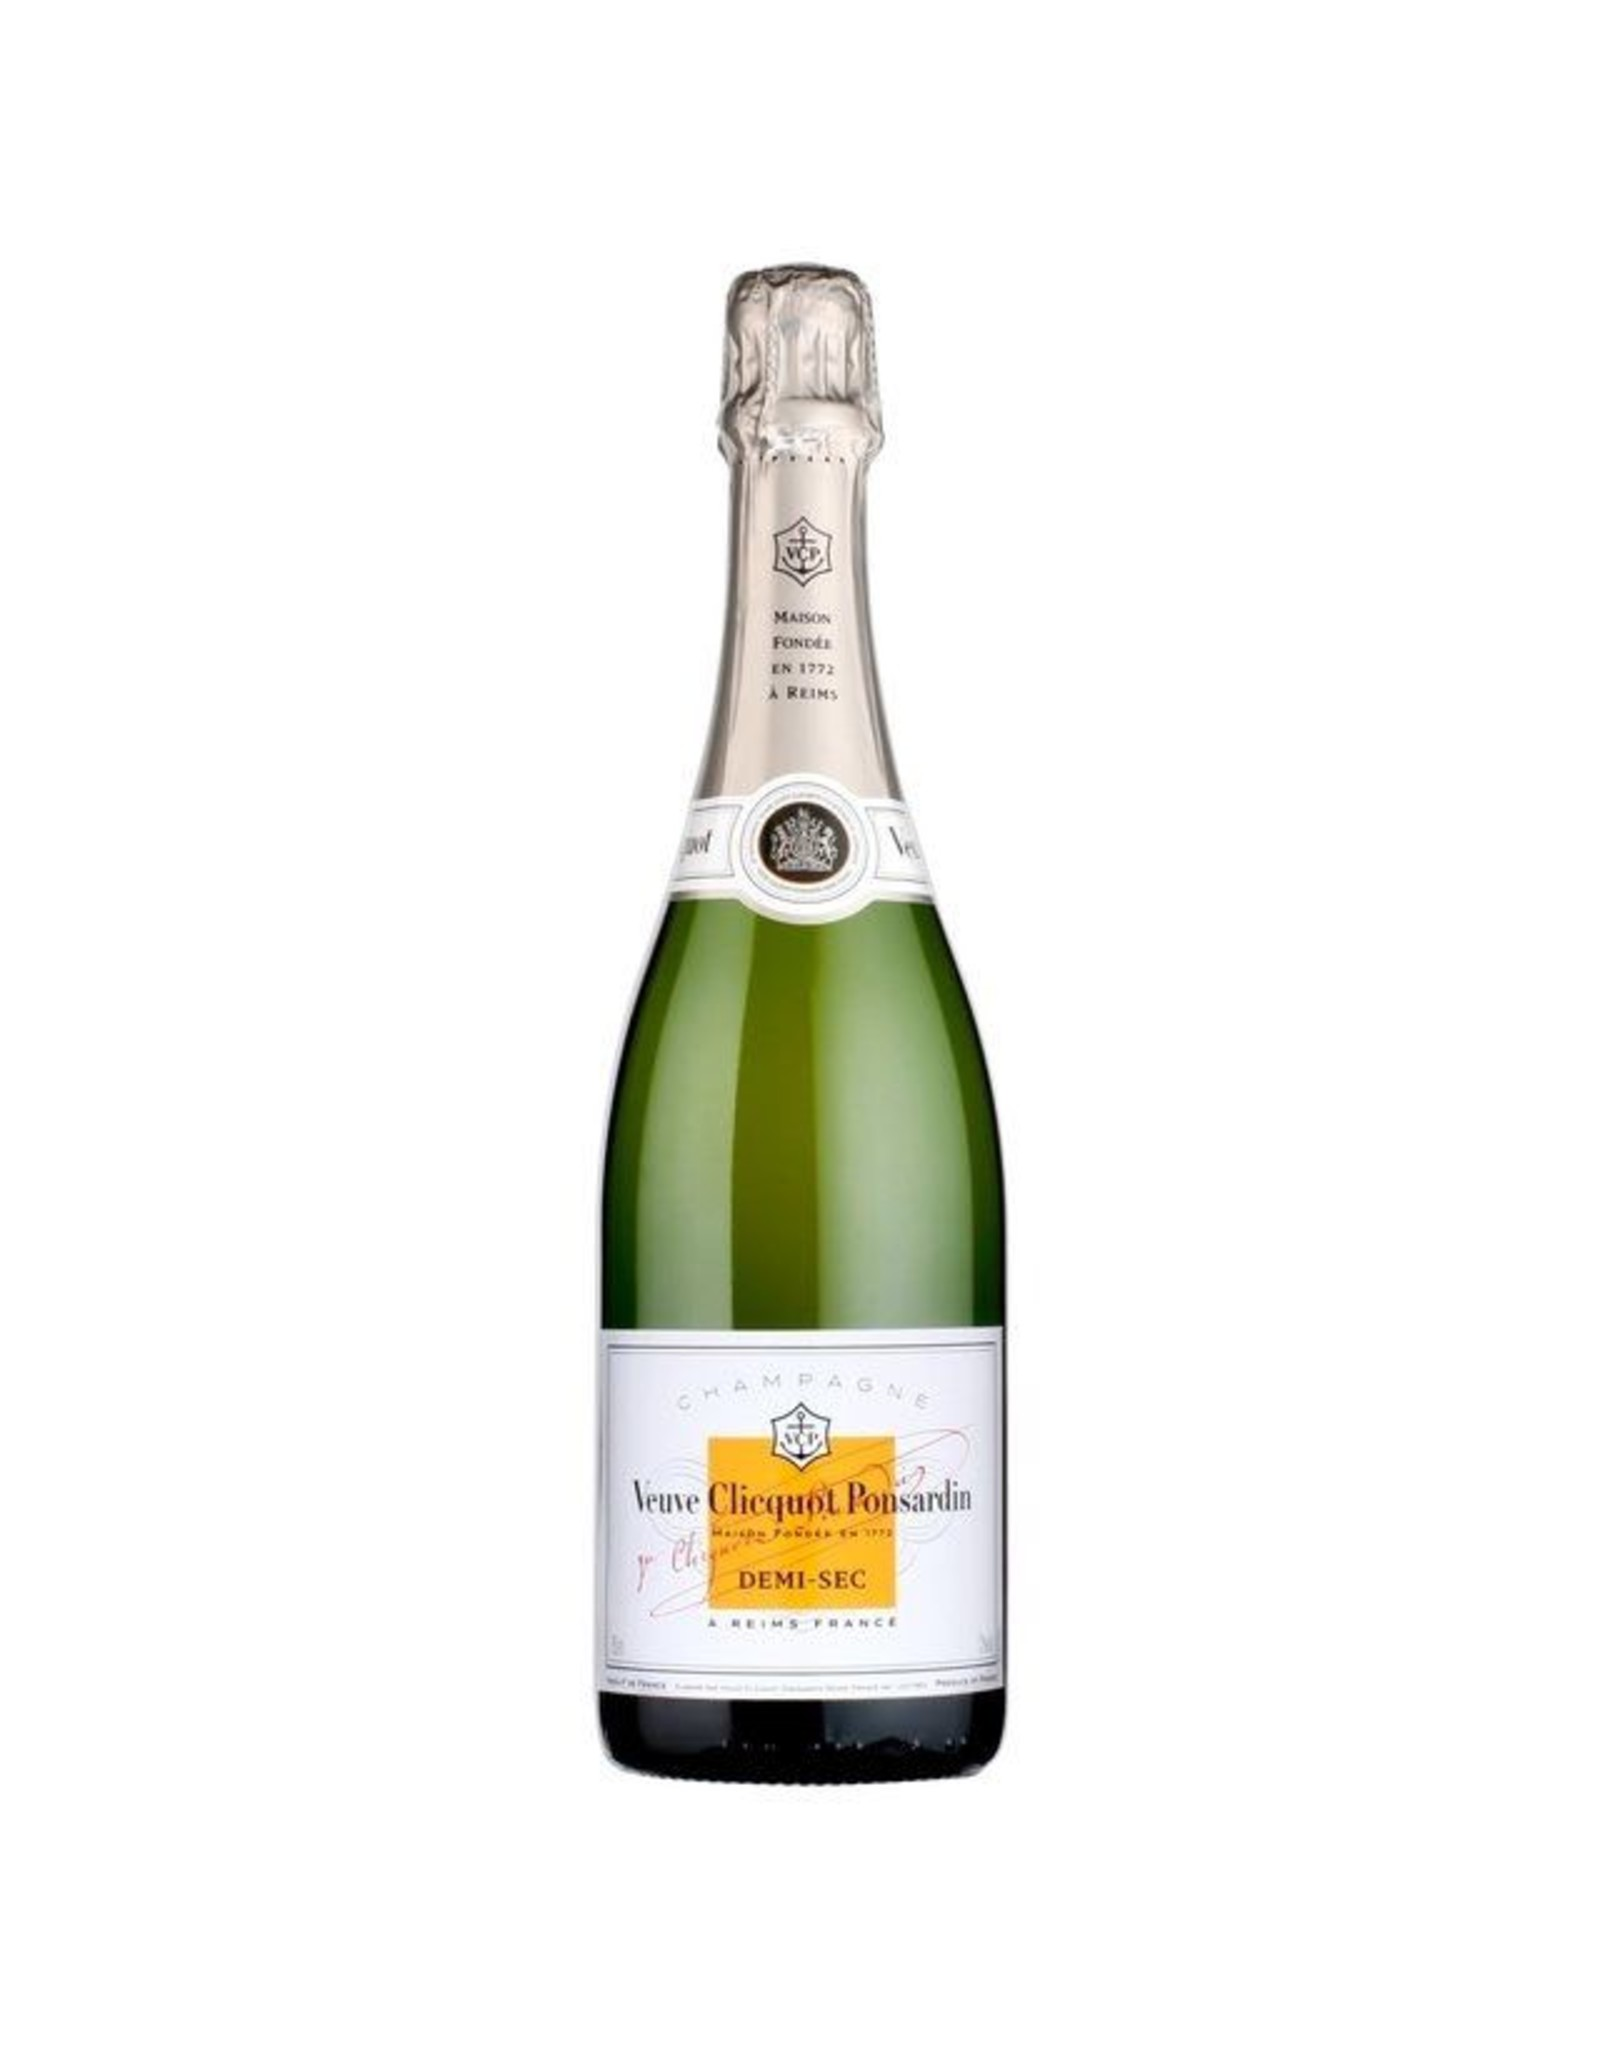 Sparkling Wine NV, Veuve Clicquot Ponsardin Demi-Sec, Champagne, Reims, Champagne, France, 12% Alc, CT87